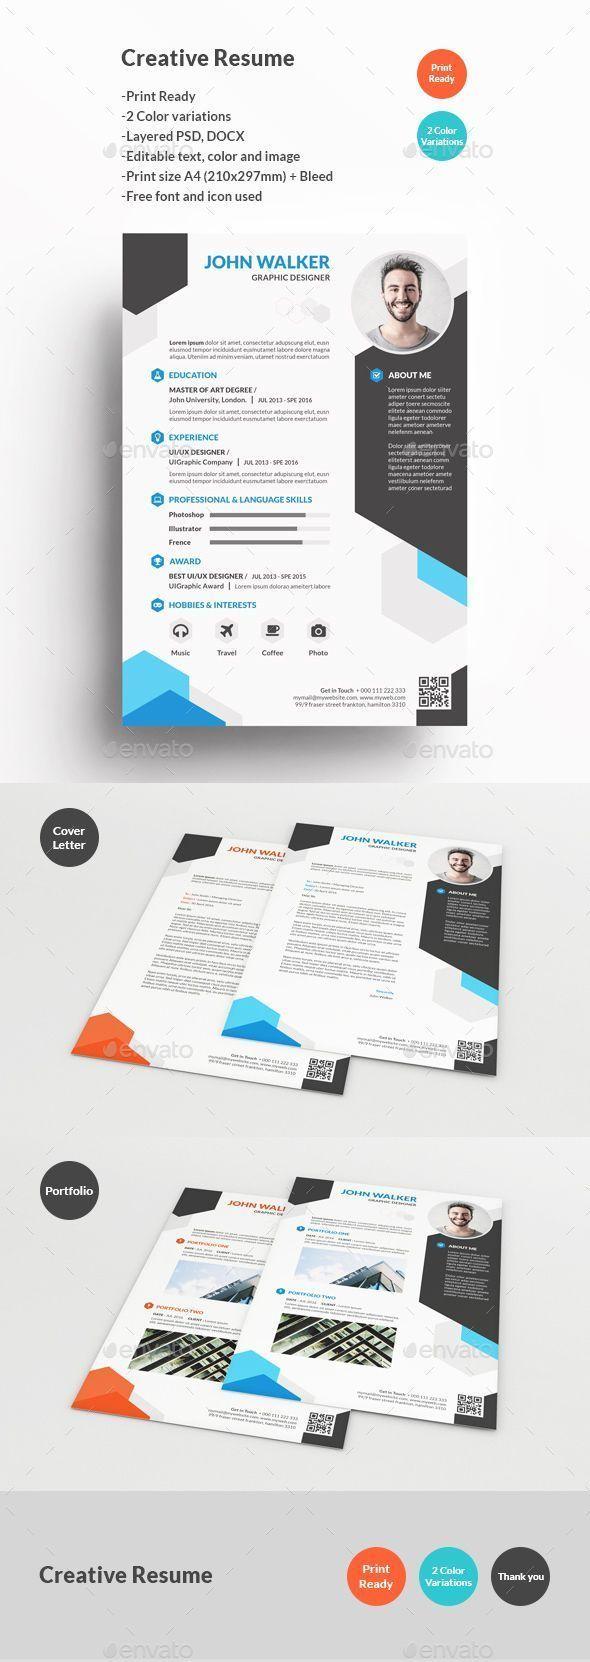 Resume infographic Resume infographic Creative Resume